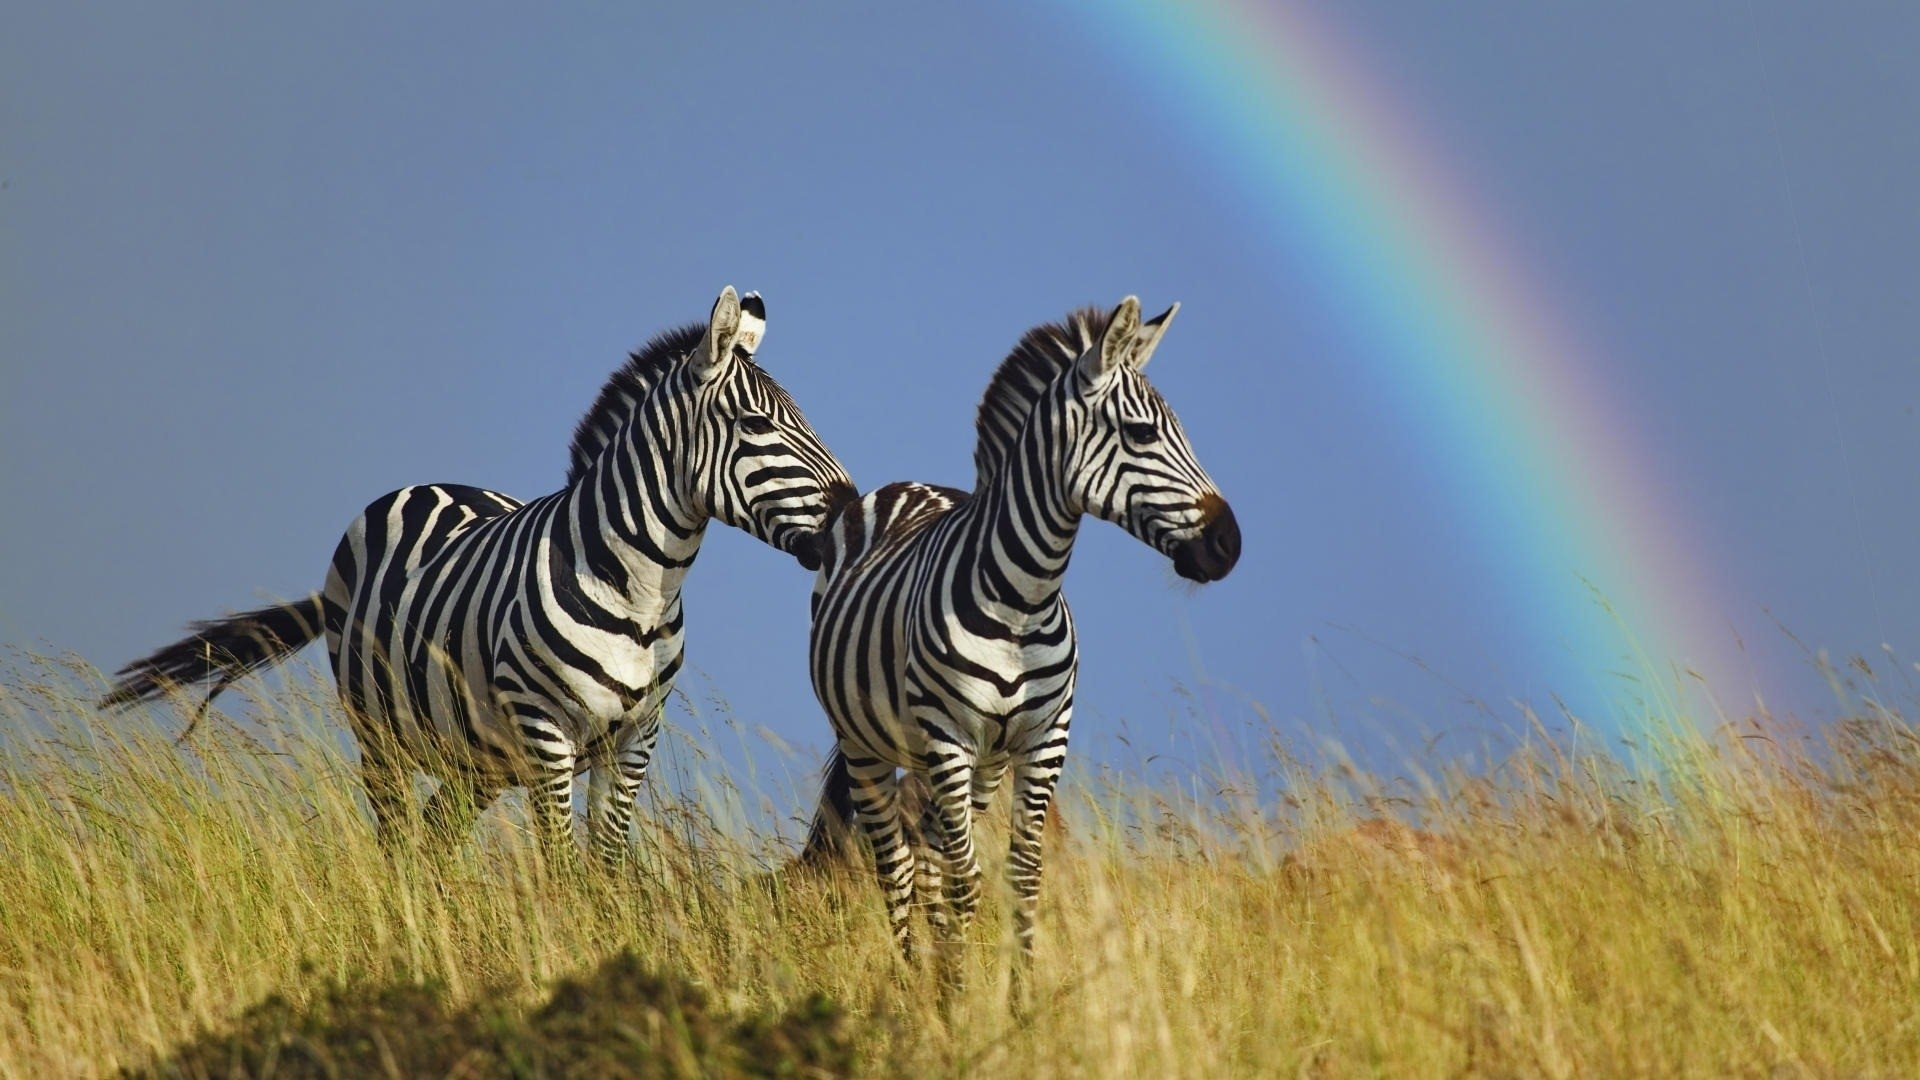 Rainbow Zebra Wallpaper (67+ images)